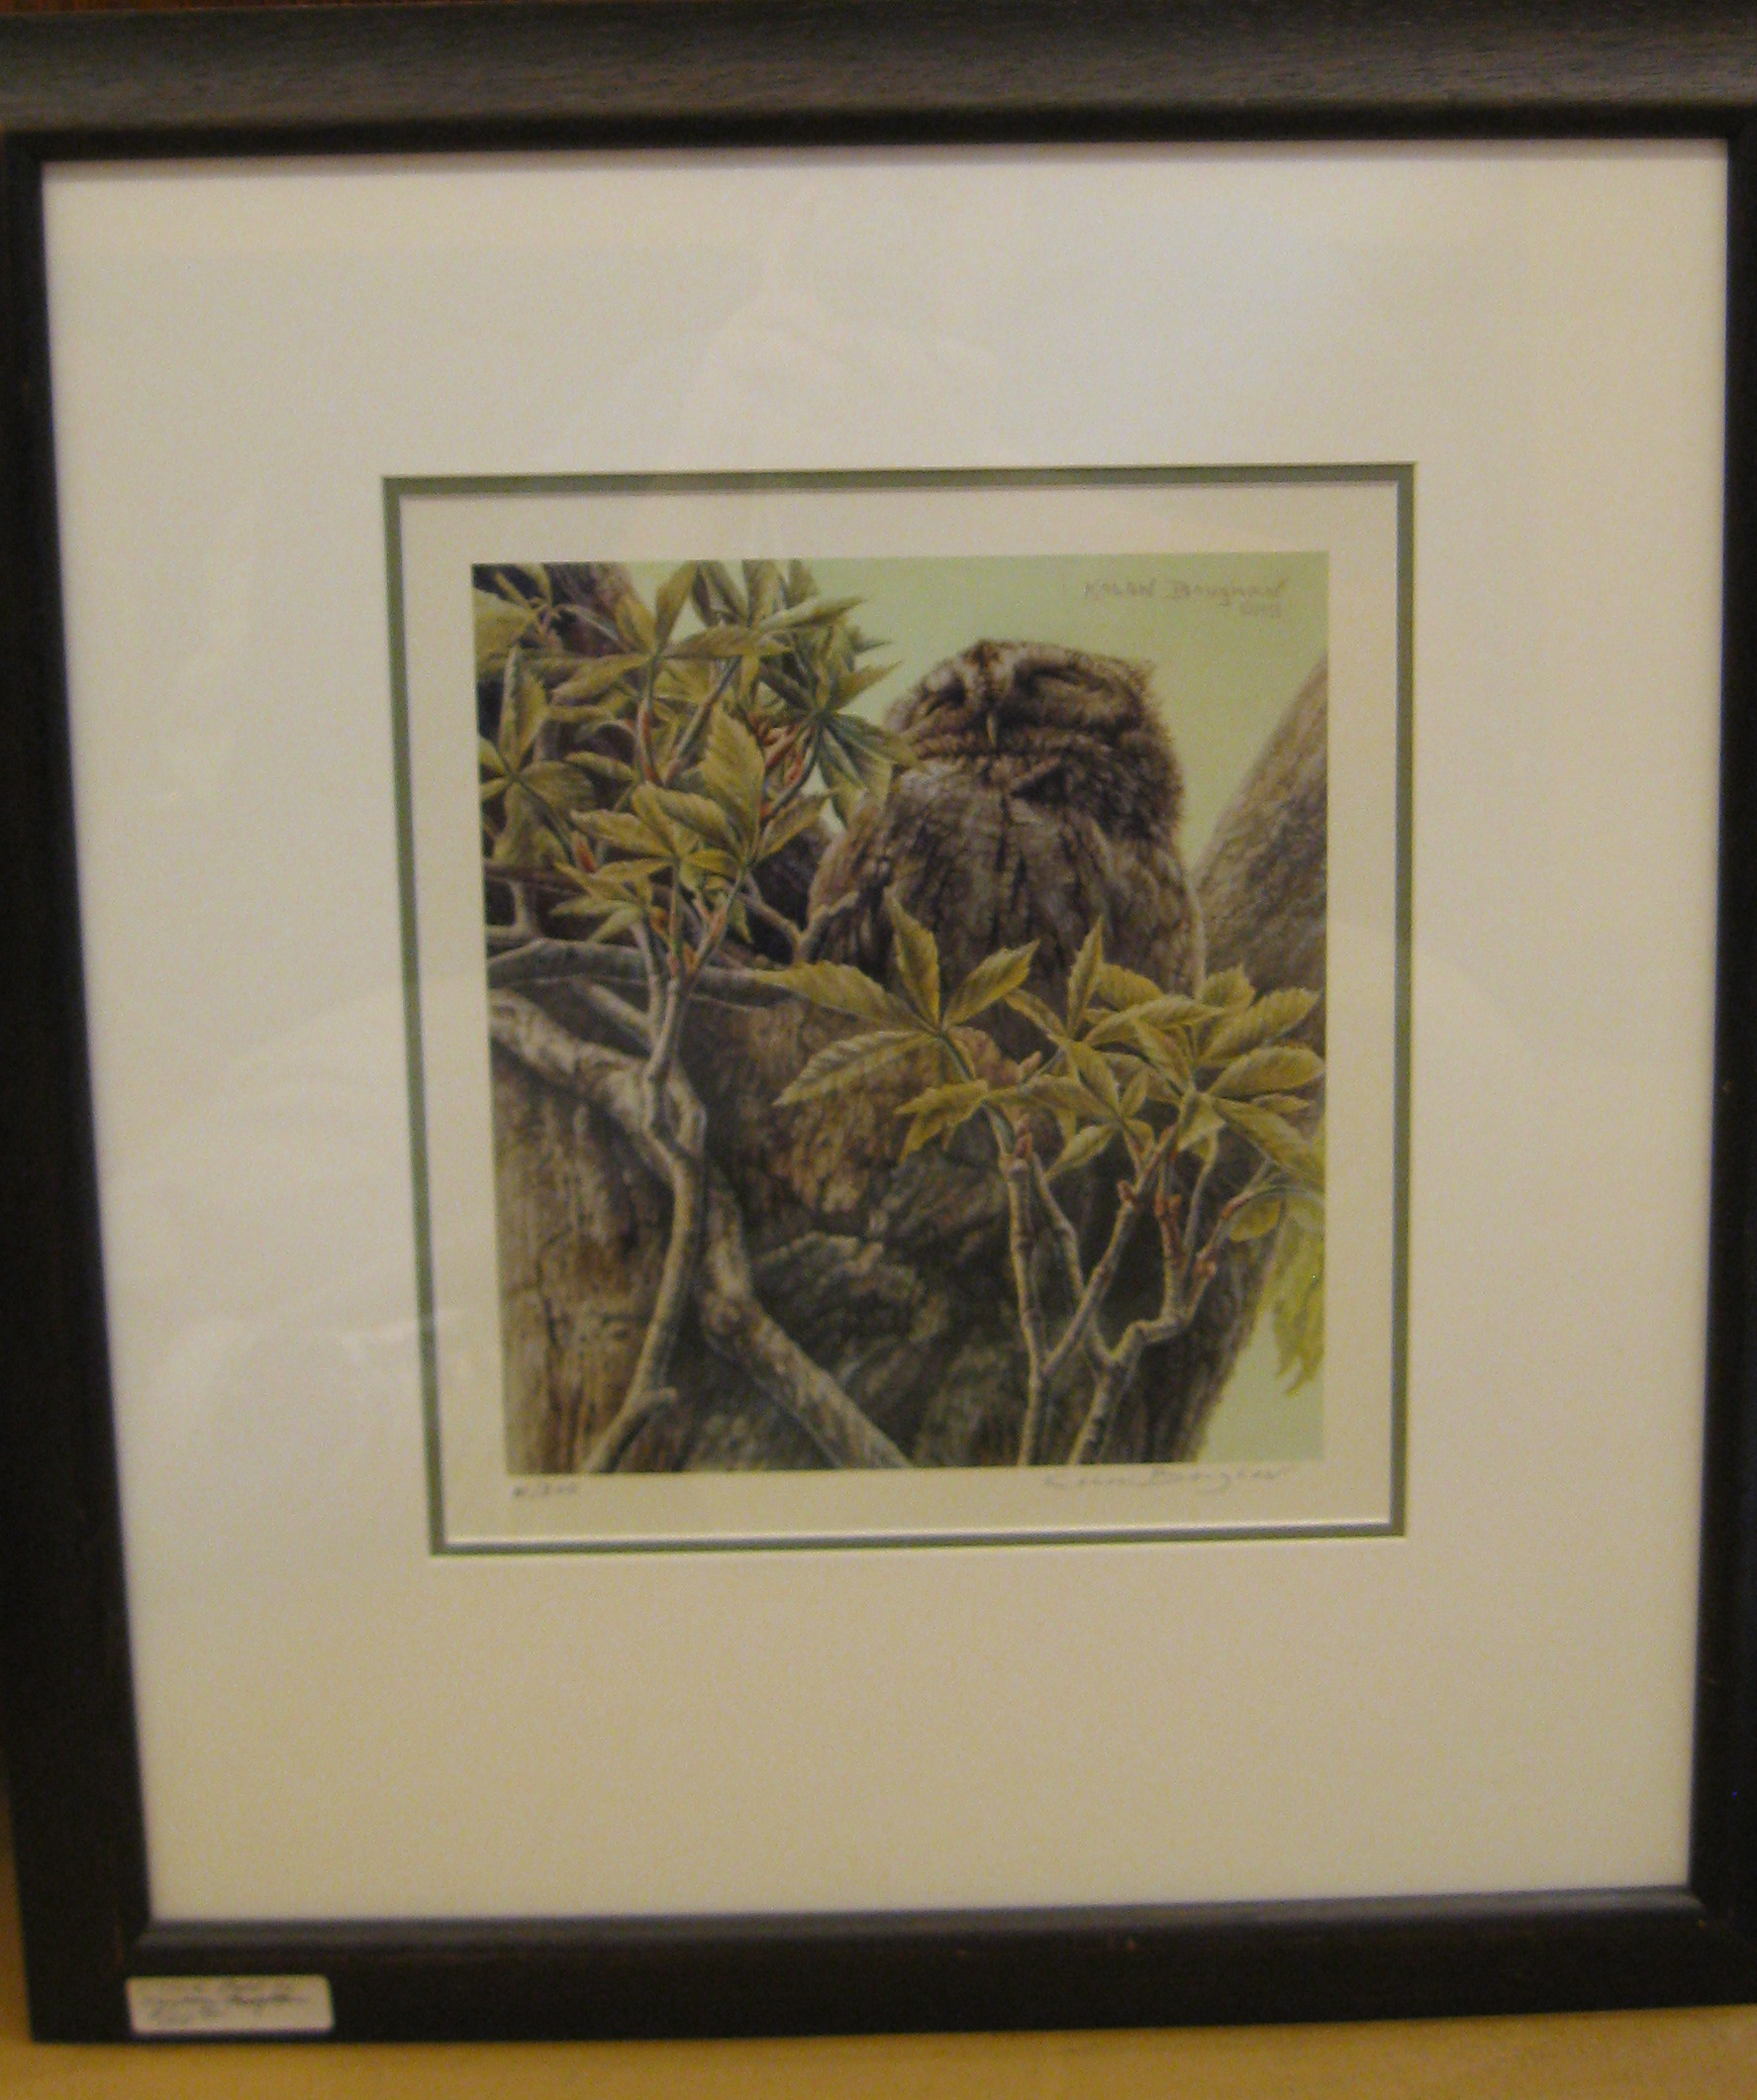 Owl in Tree Signed Kaylon Baughan Print No. 61/300 - 22 1/4